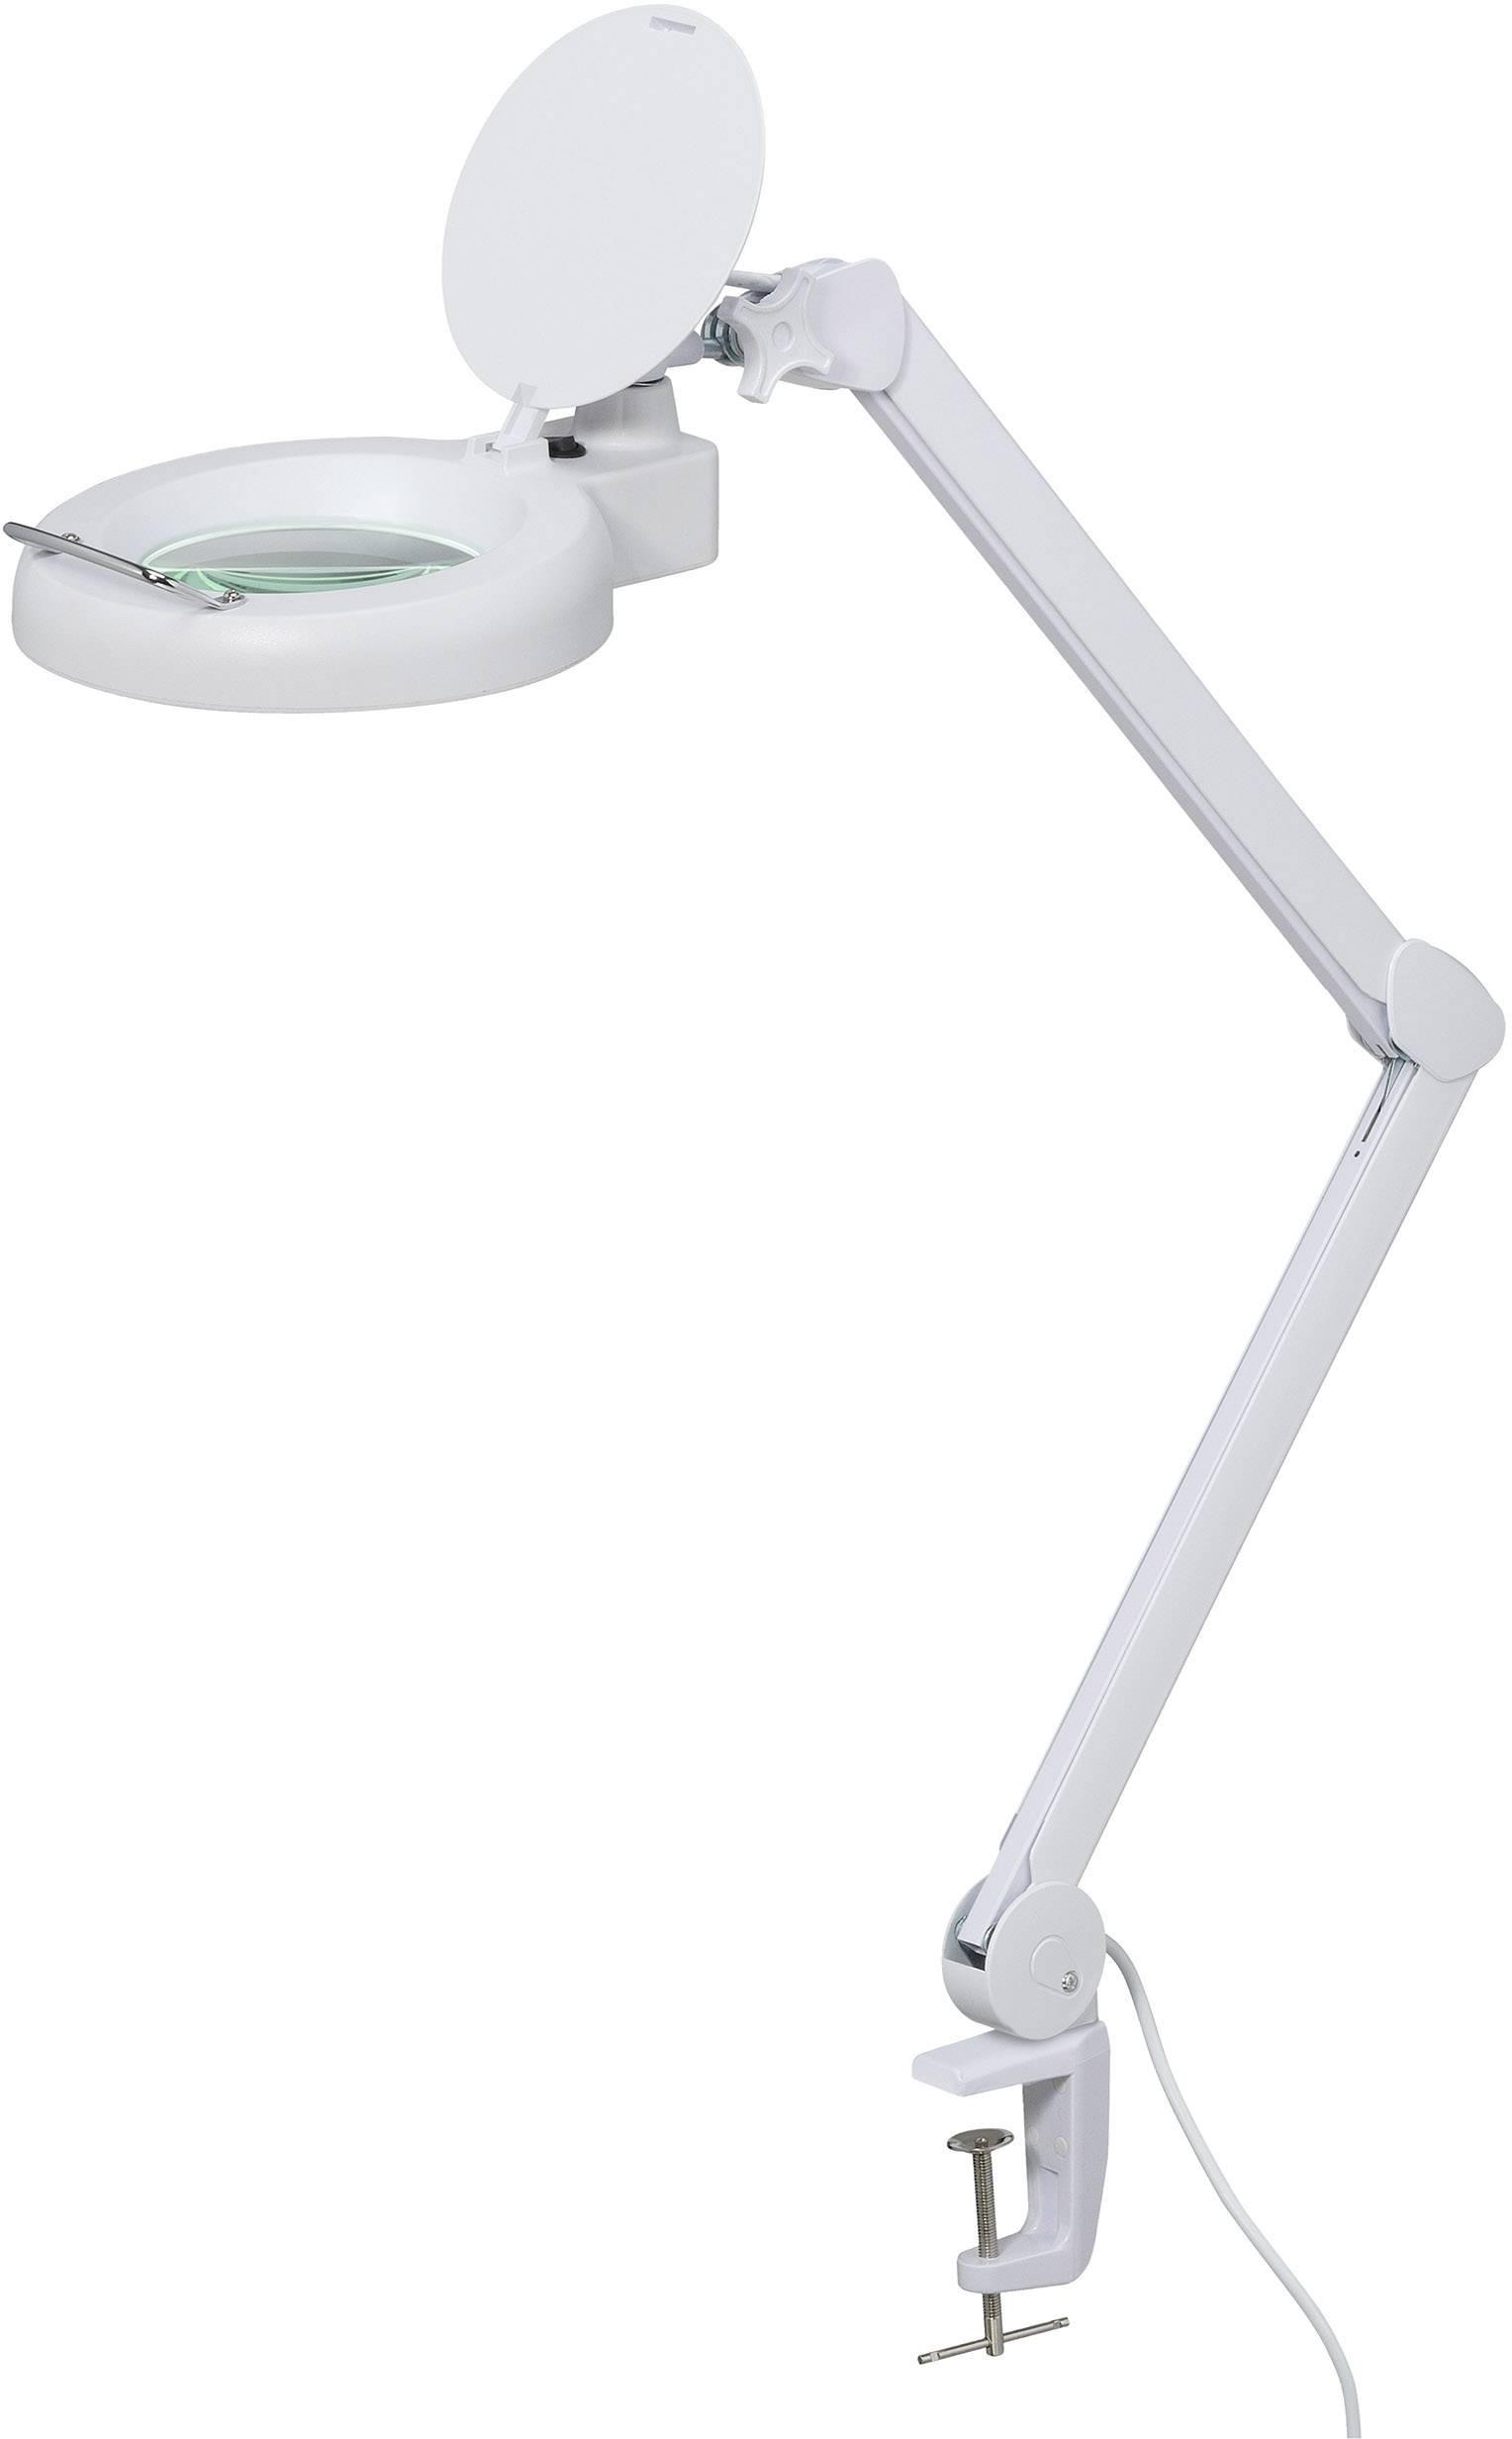 Stolná lupa s LED osvetlením TOOLCRAFT 1526044, prac.rádius 127 mm